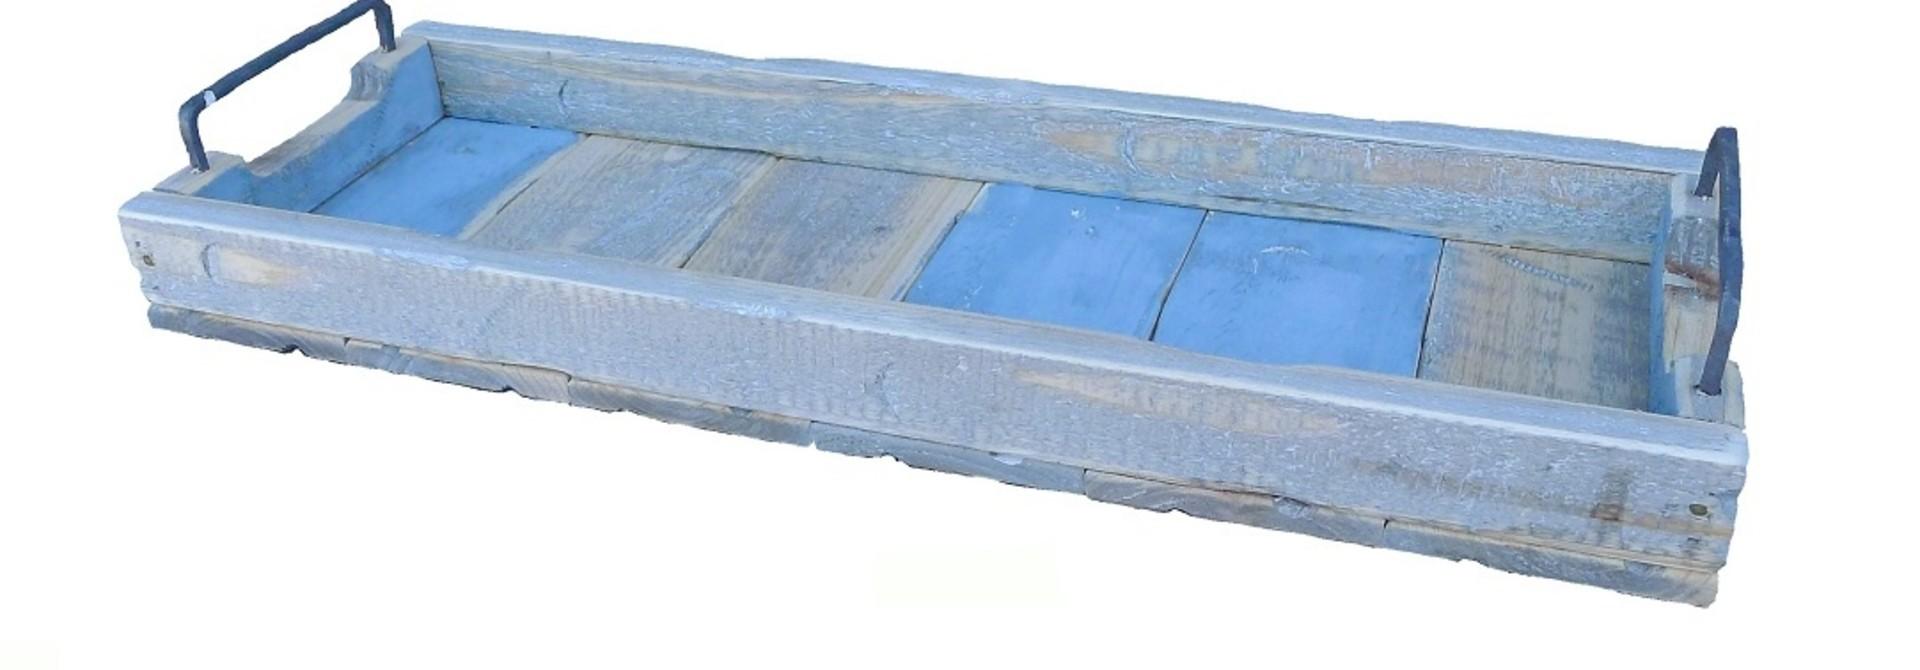 Tablett rechteckig blau - 58/20